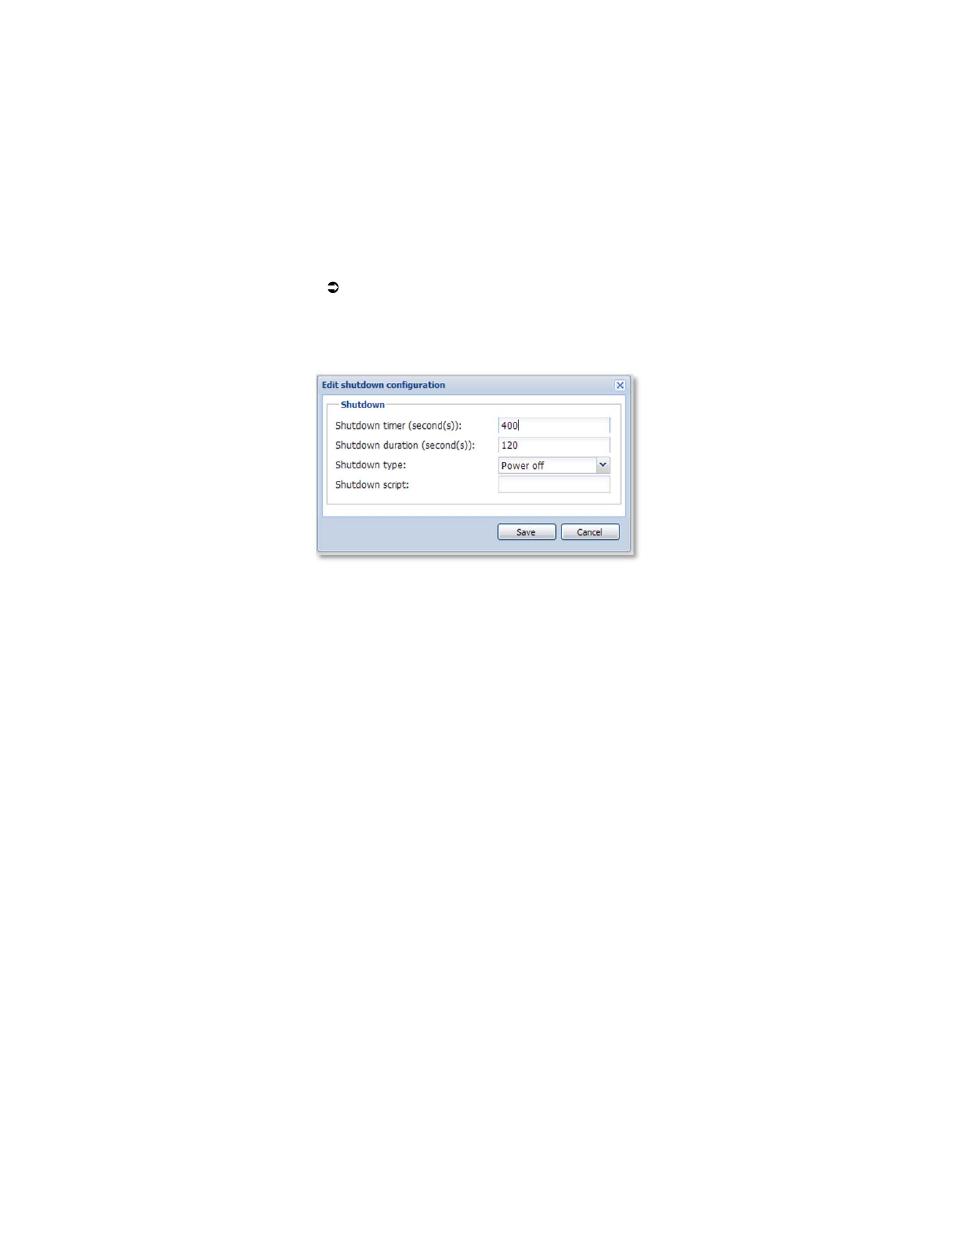 Appendix 2 shutdown settings, Shutdown setting listing and